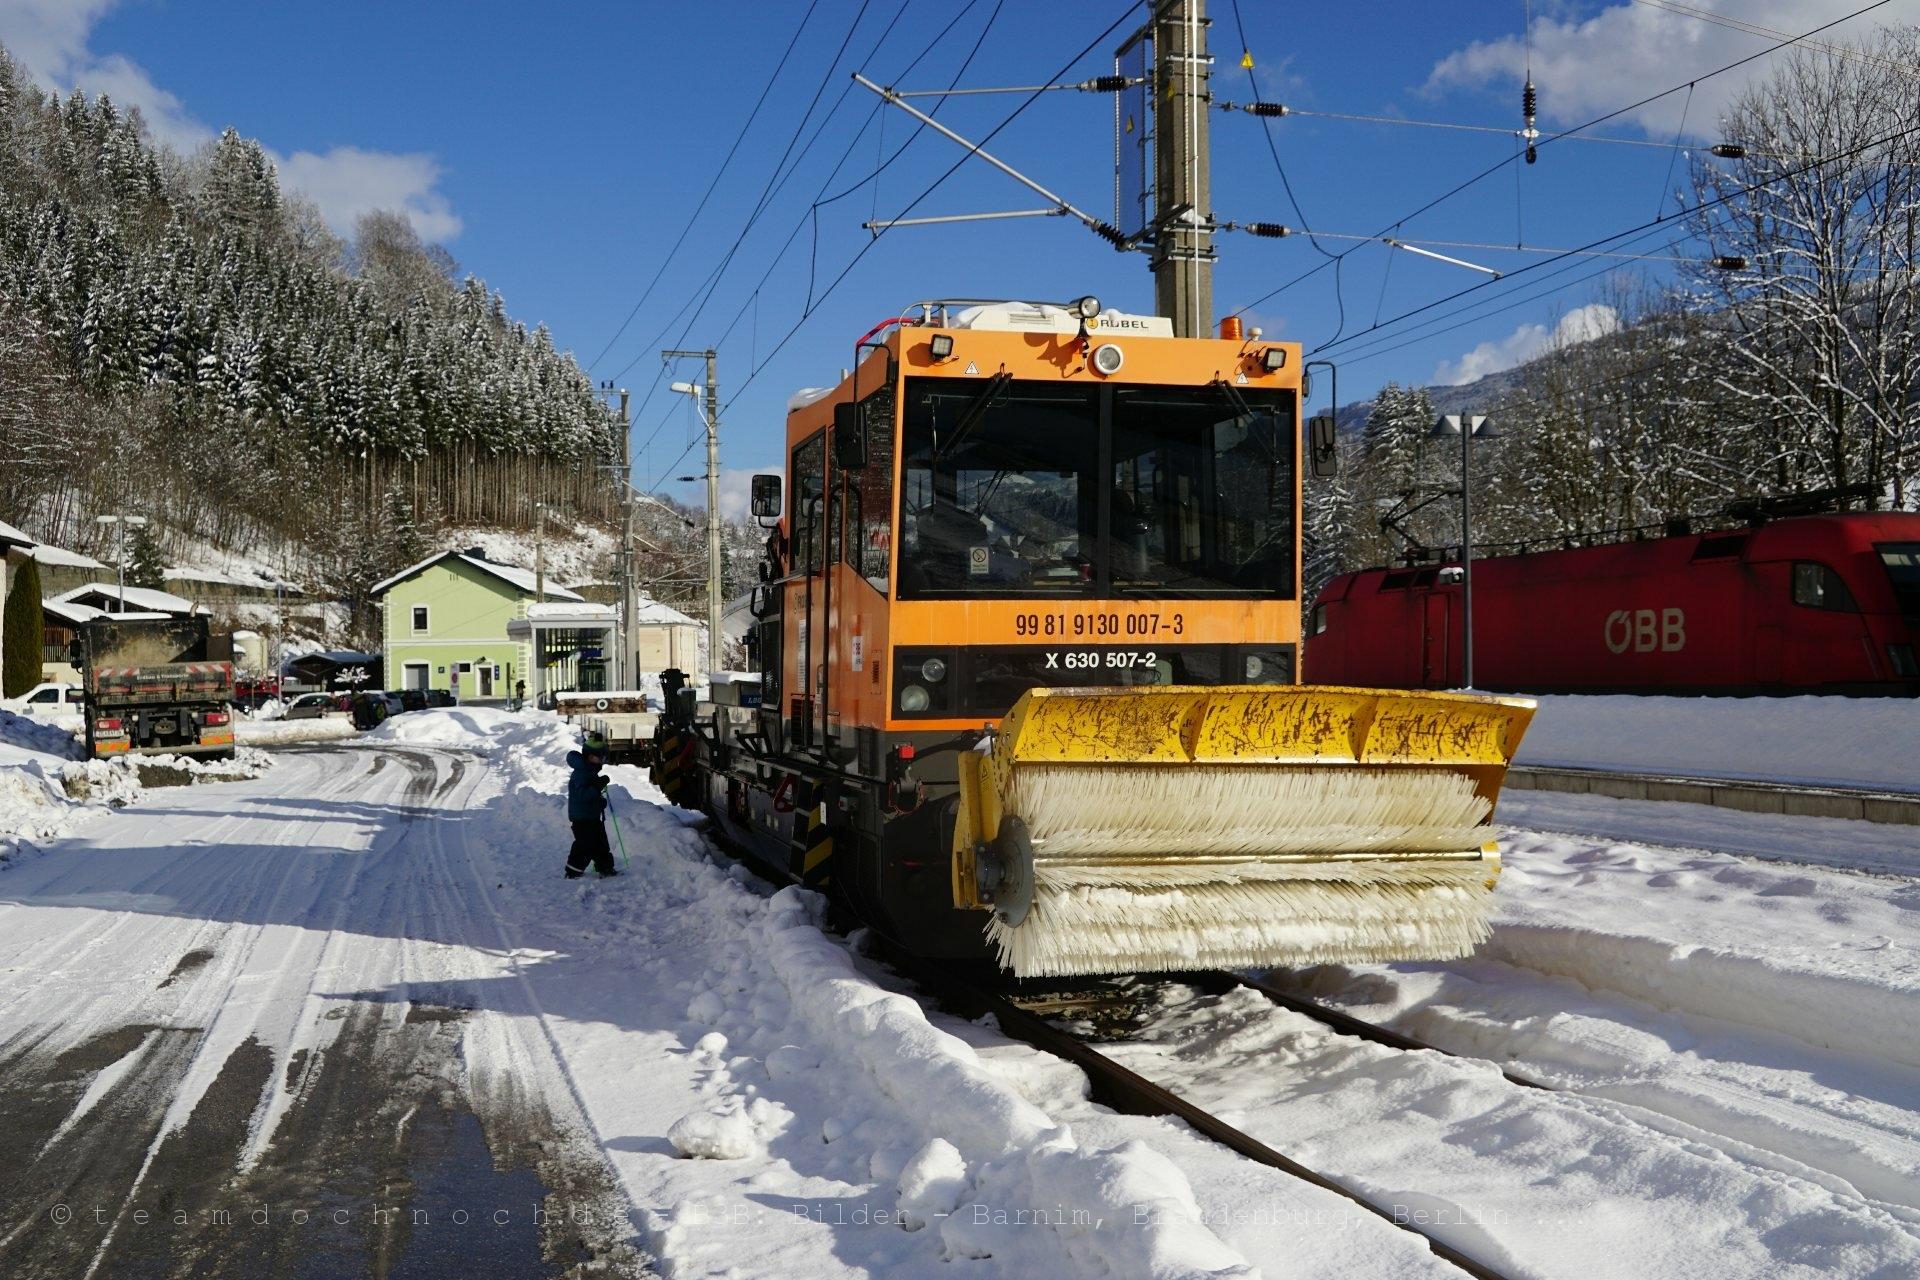 Schneefegerobel im Bahnhof Taxenbach